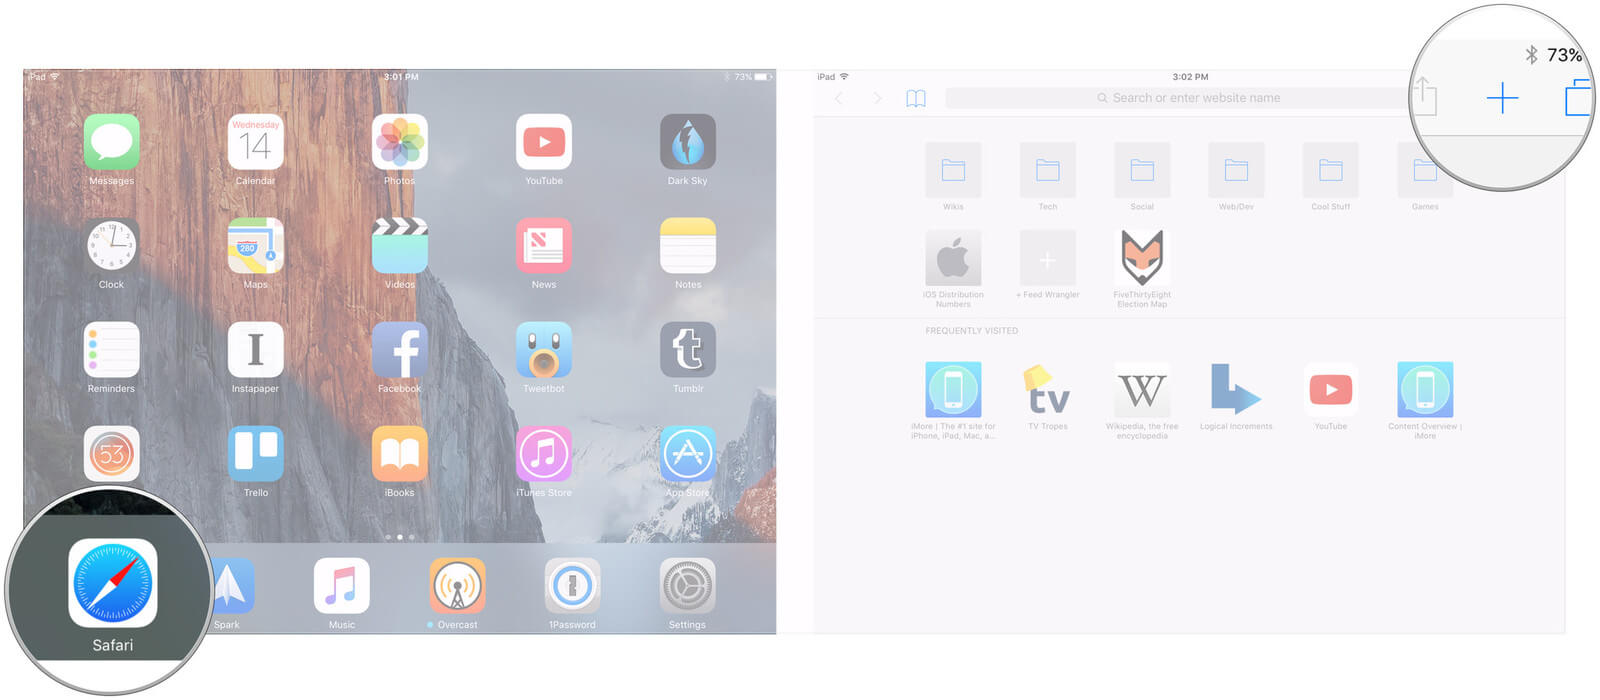 Cara Membuka Kembali Tab Yang di Tutup di iOS 11 Safari Pada iPhone dan iPad